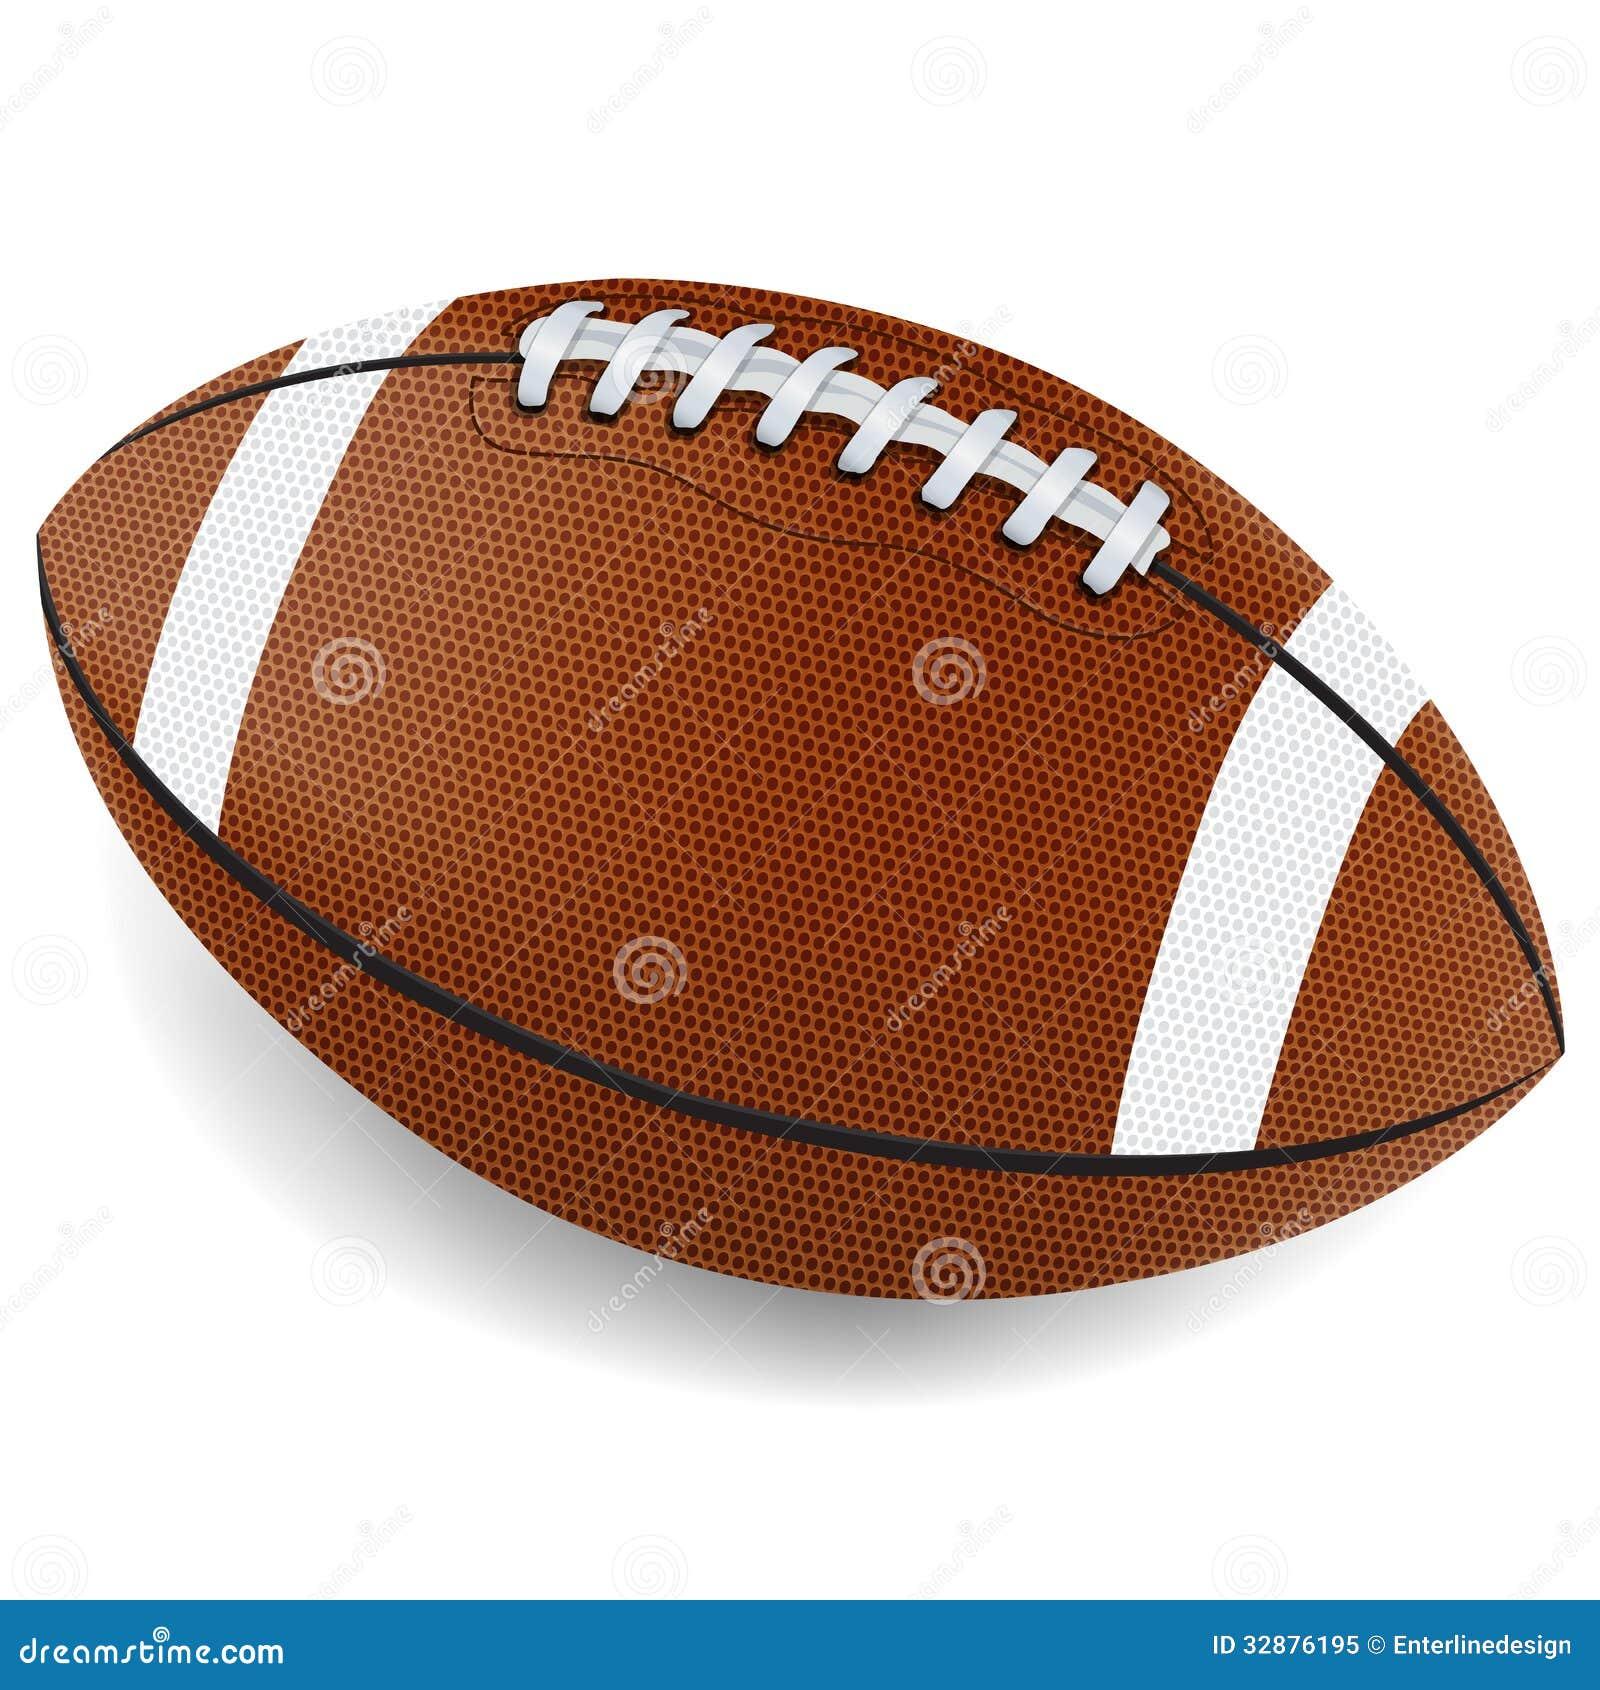 Realistic Football Illustration Stock Vector Image 32876195